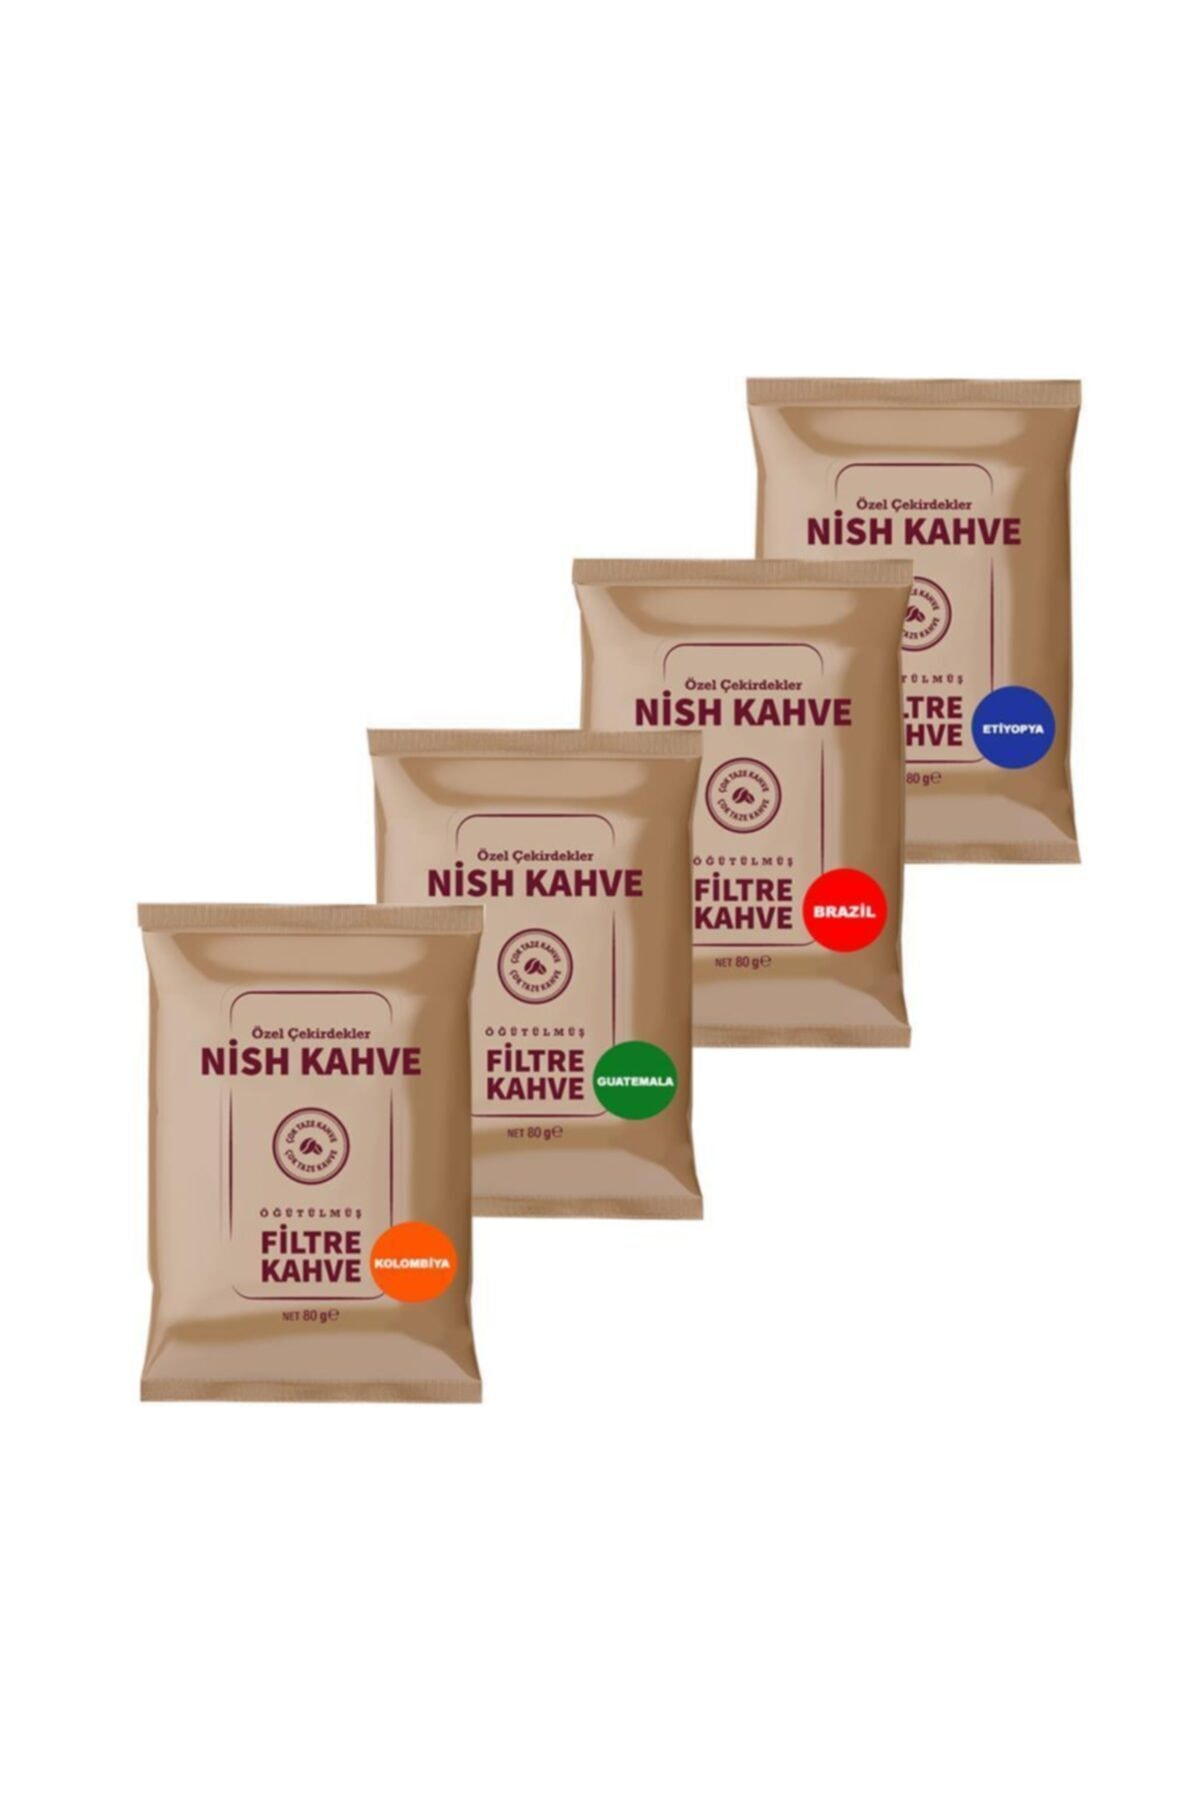 Nish Kahve Filtre Kahve Nish Brazil Colombia Guatemala Etiyopya 80 Gr 4'lü Paket 2